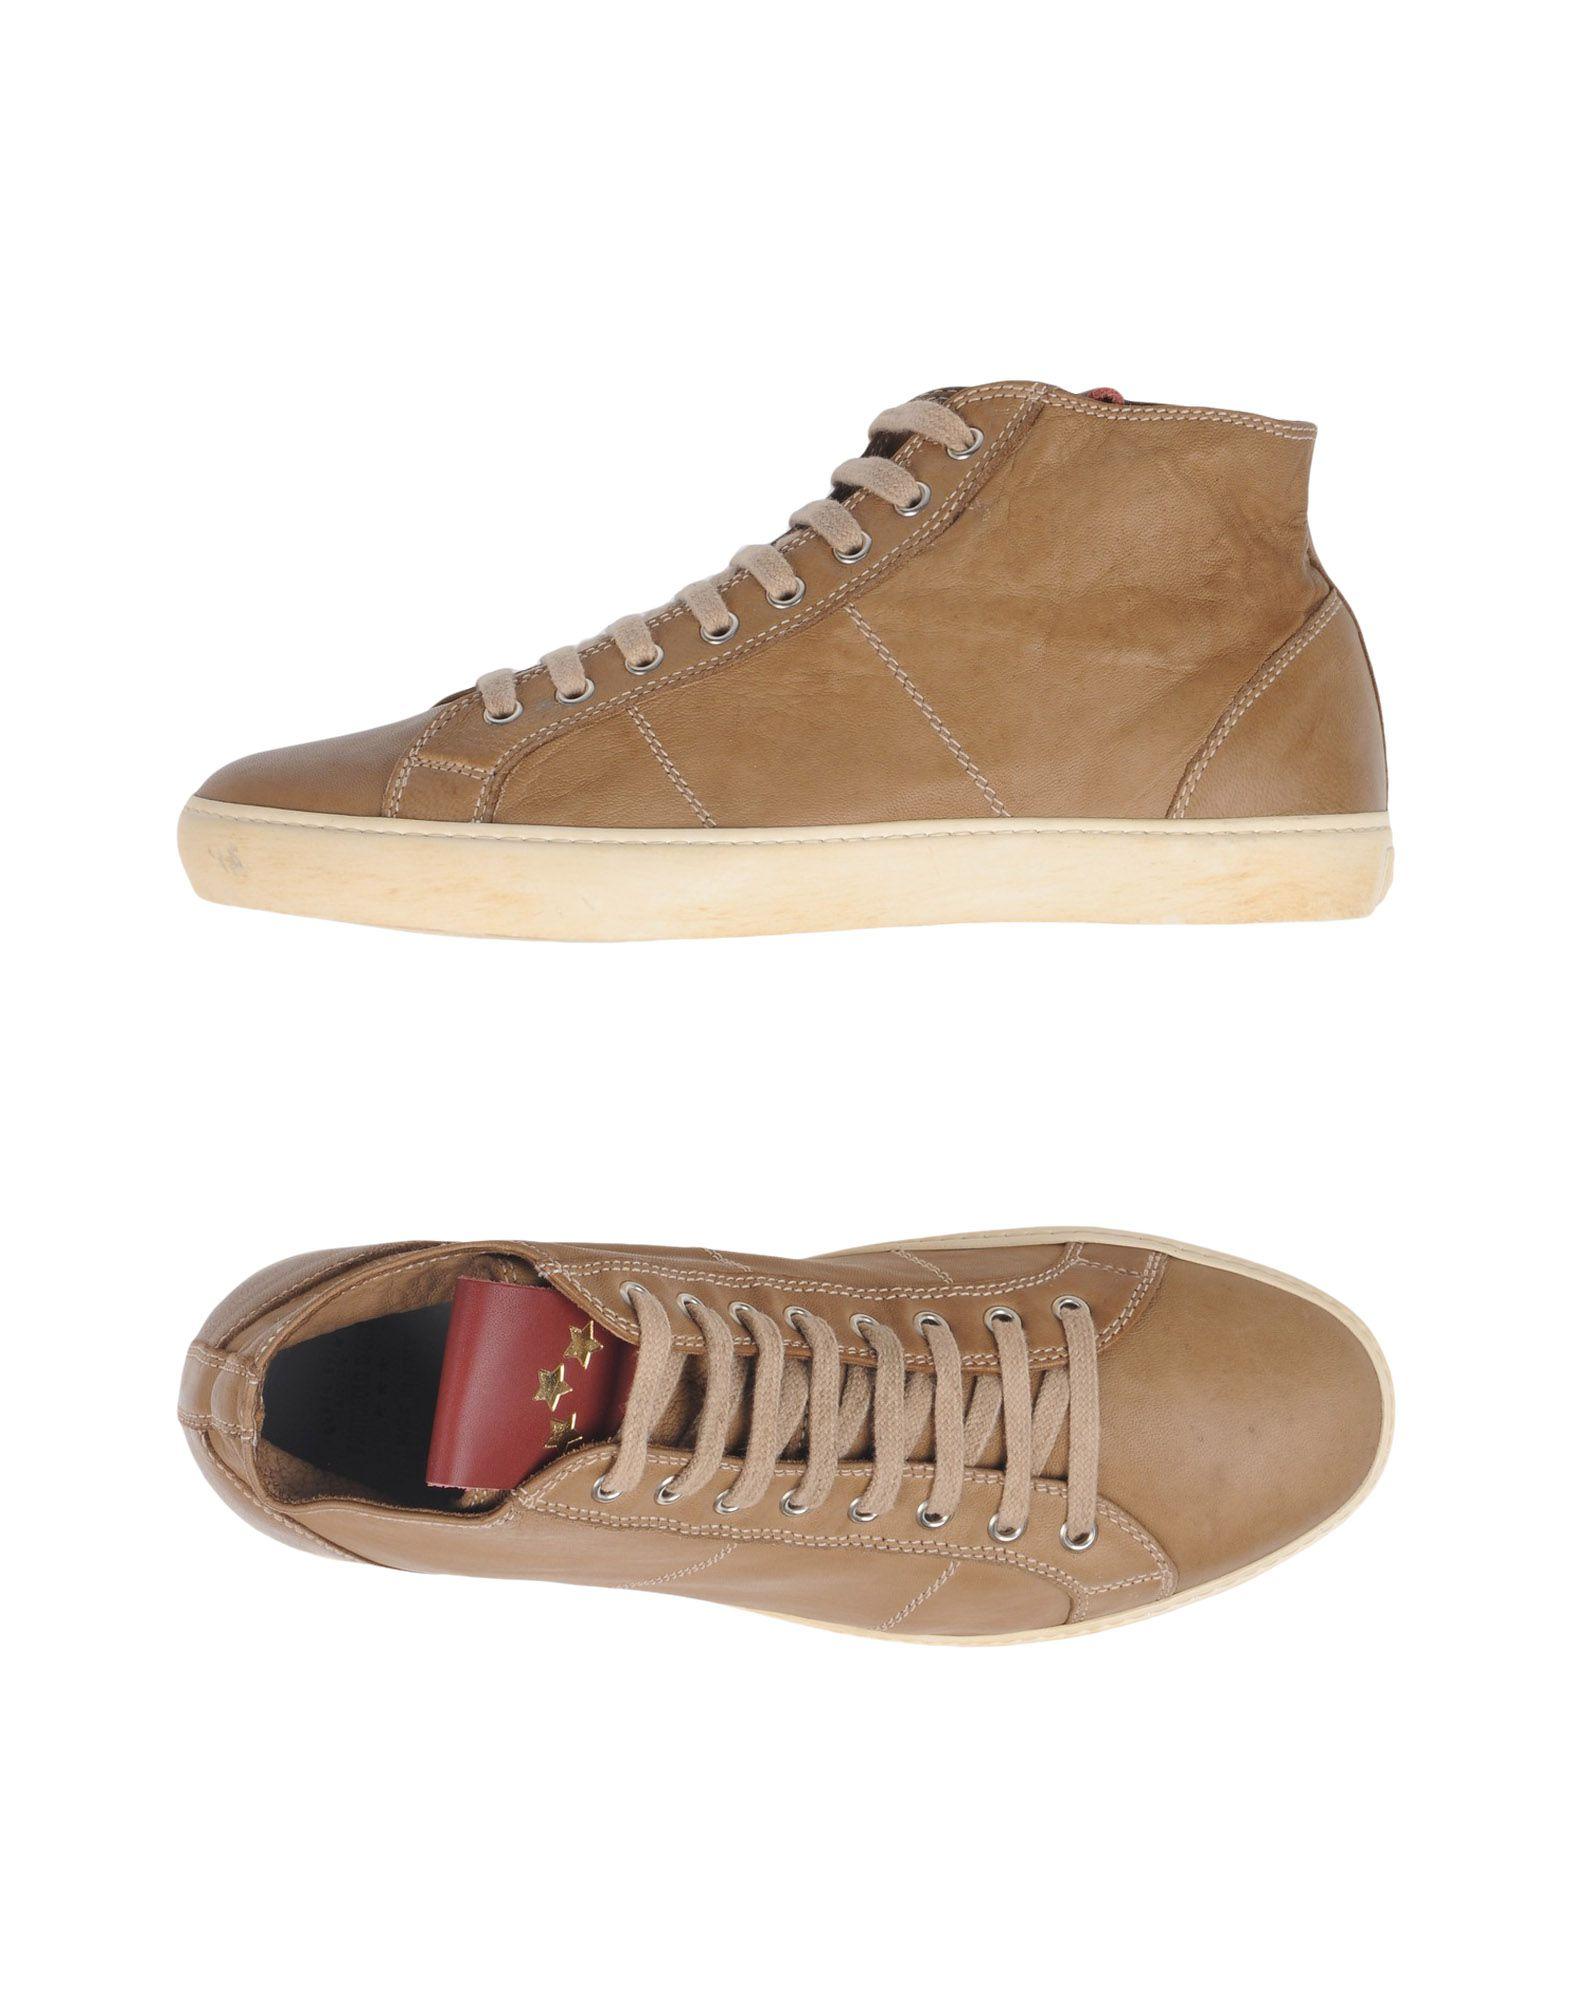 Rabatt echte Schuhe Pantofola D'oro Sneakers Herren  11353993BU